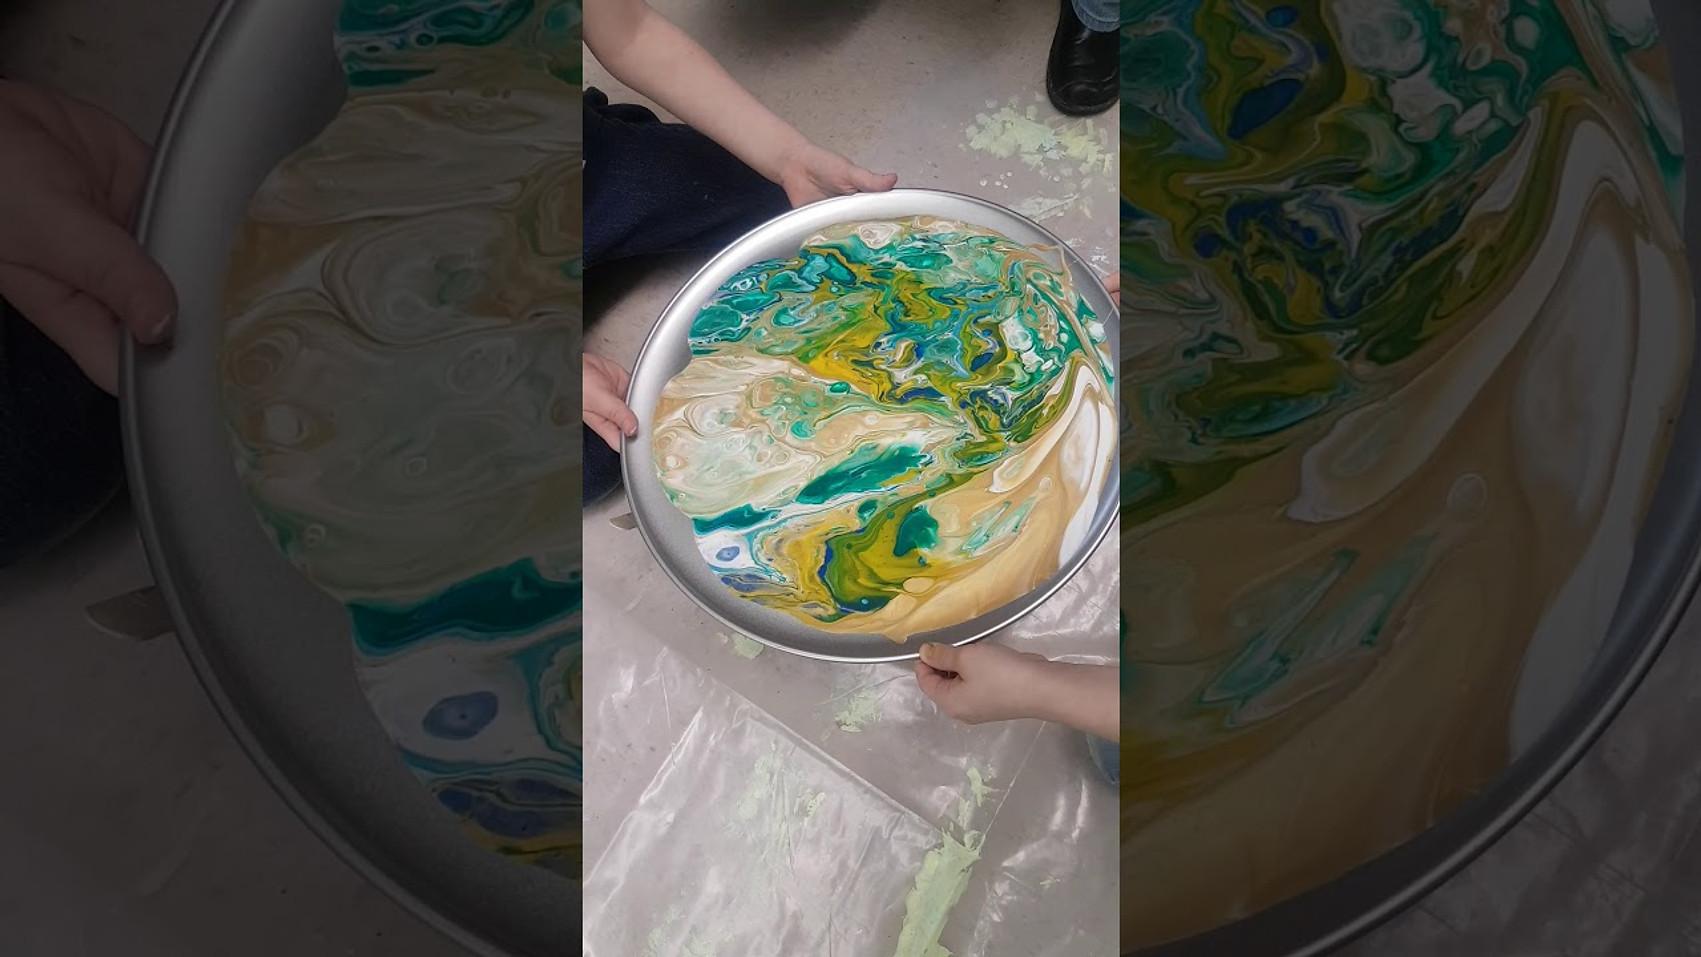 Acrylic Pour trials